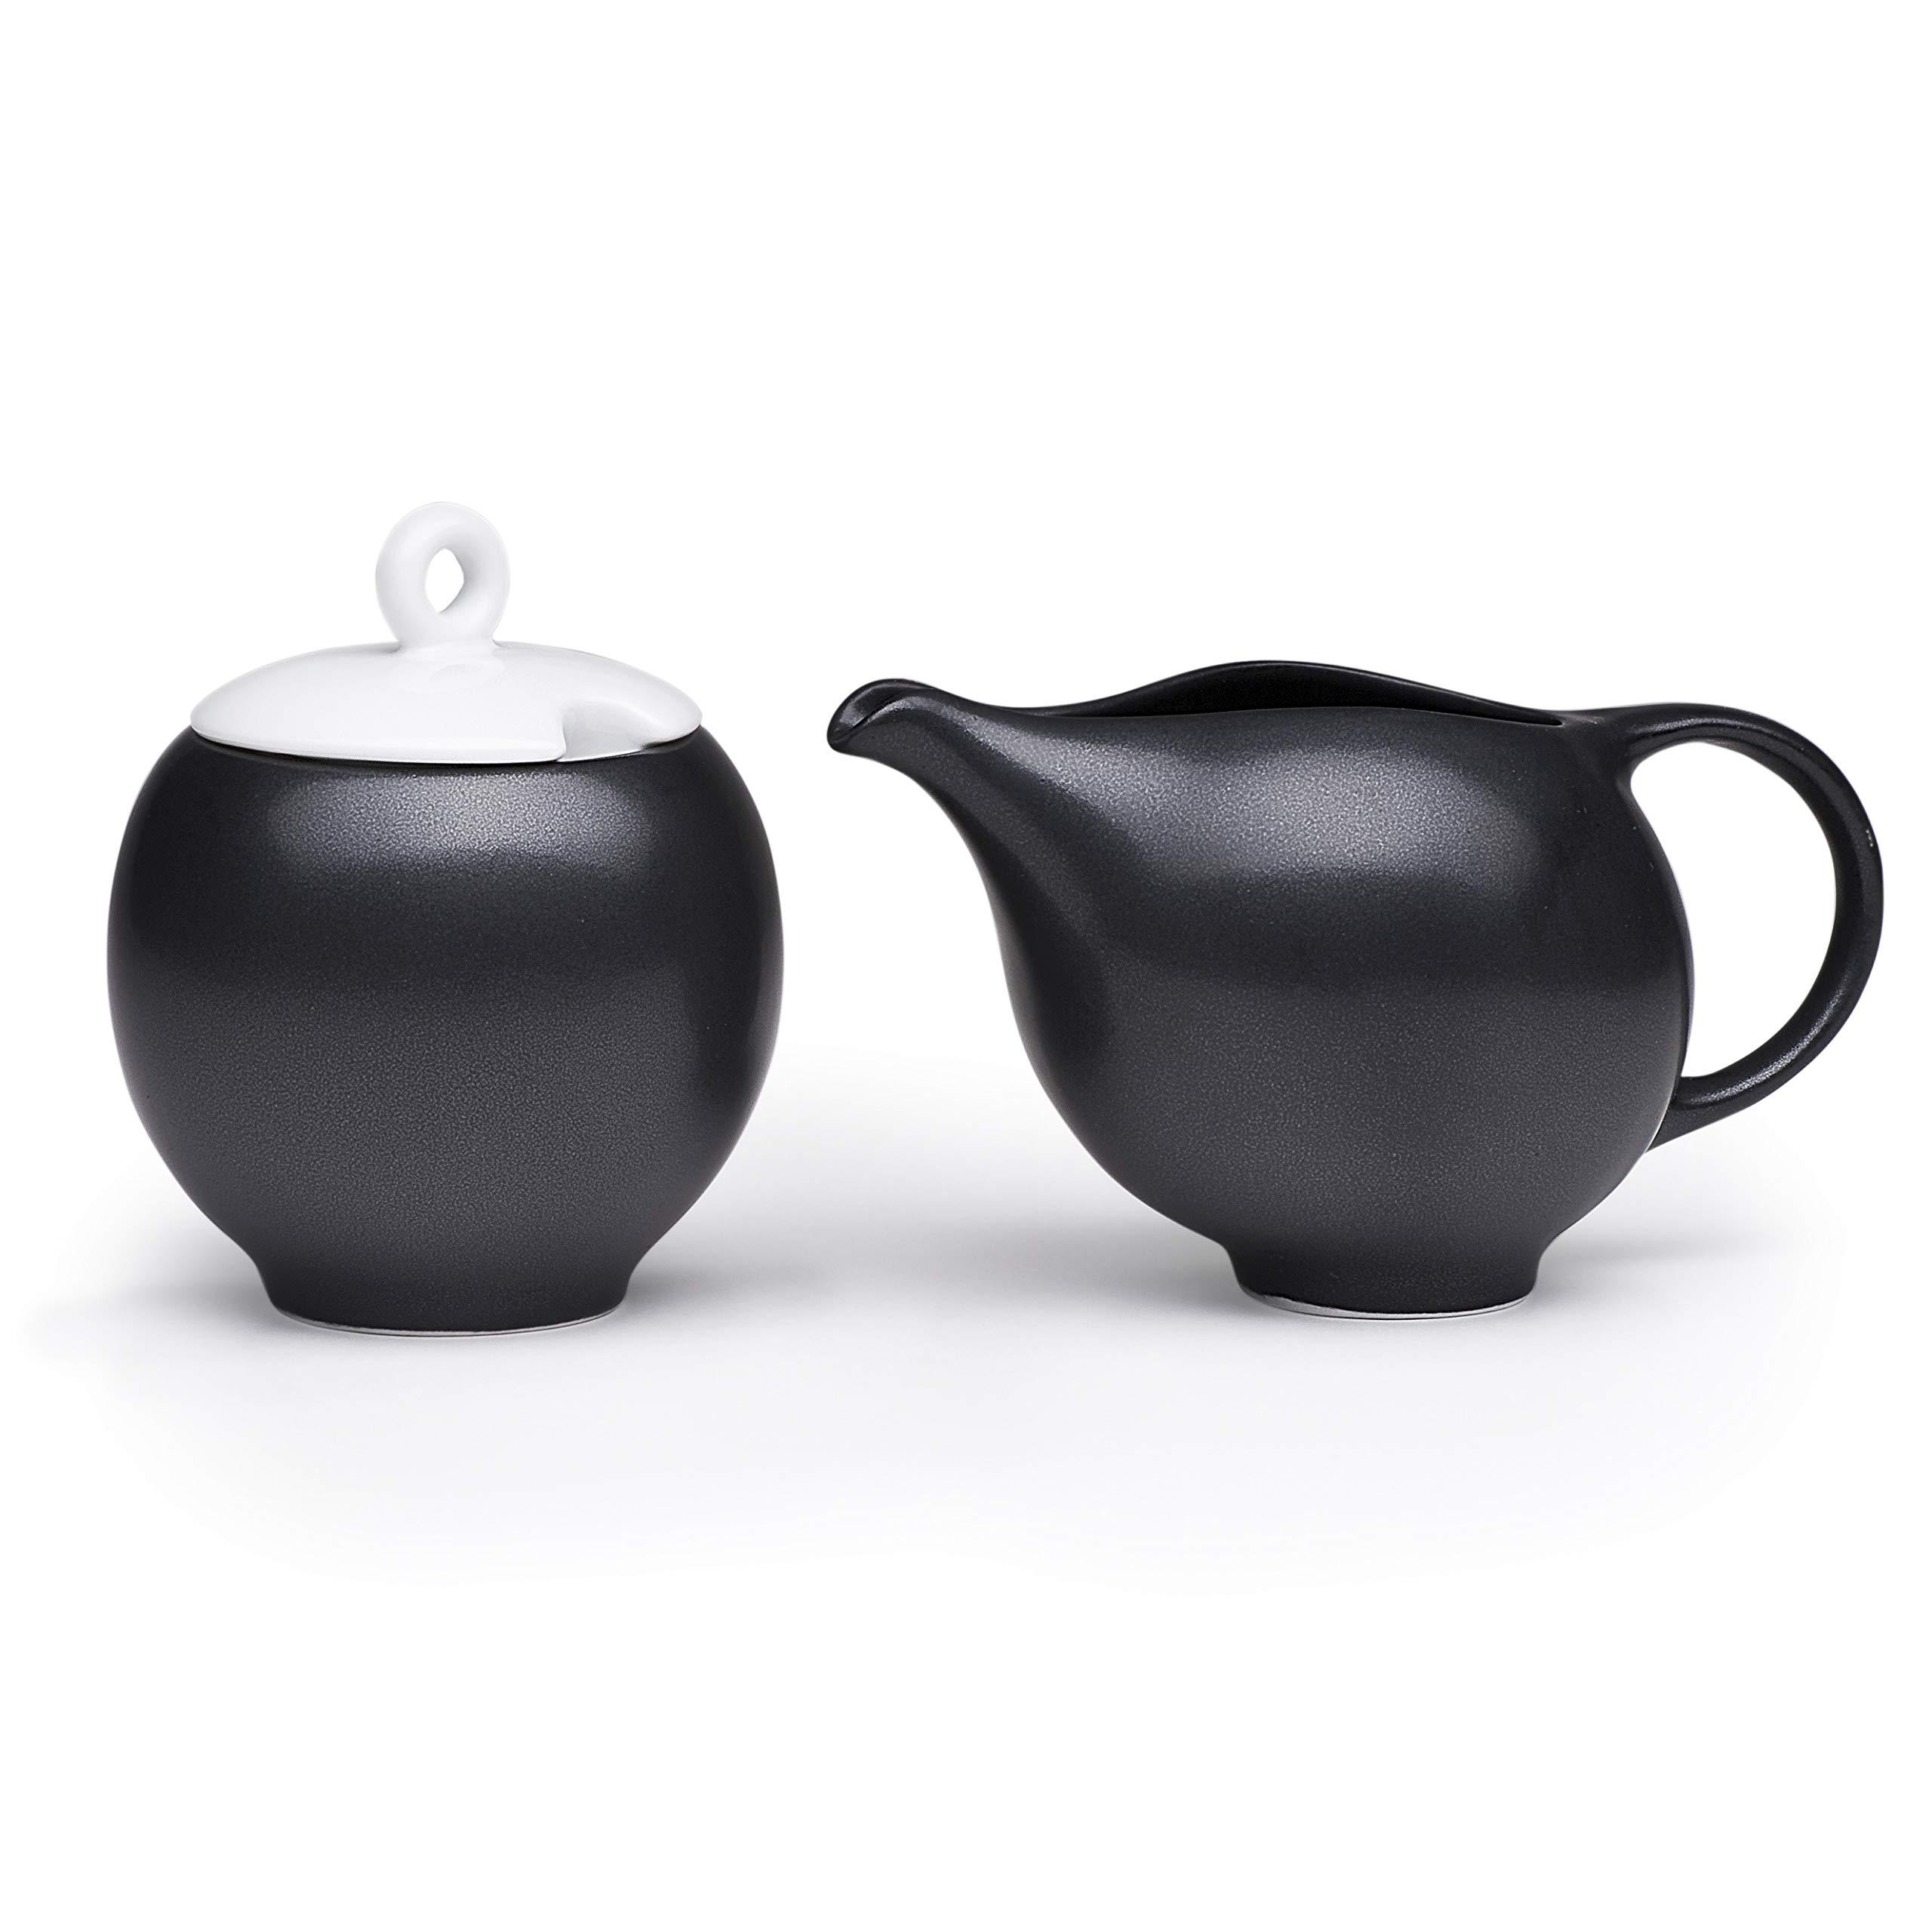 Maia Ming Designs | EVA 2-Piece Ceramic Creamer and Sugar Bowl w/Lid | Coffee Tea Serving Set in Black-White Stoneware | 7oz No-Drip Milk Pitcher and Sugar Jar | Eva Zeisel Inspired